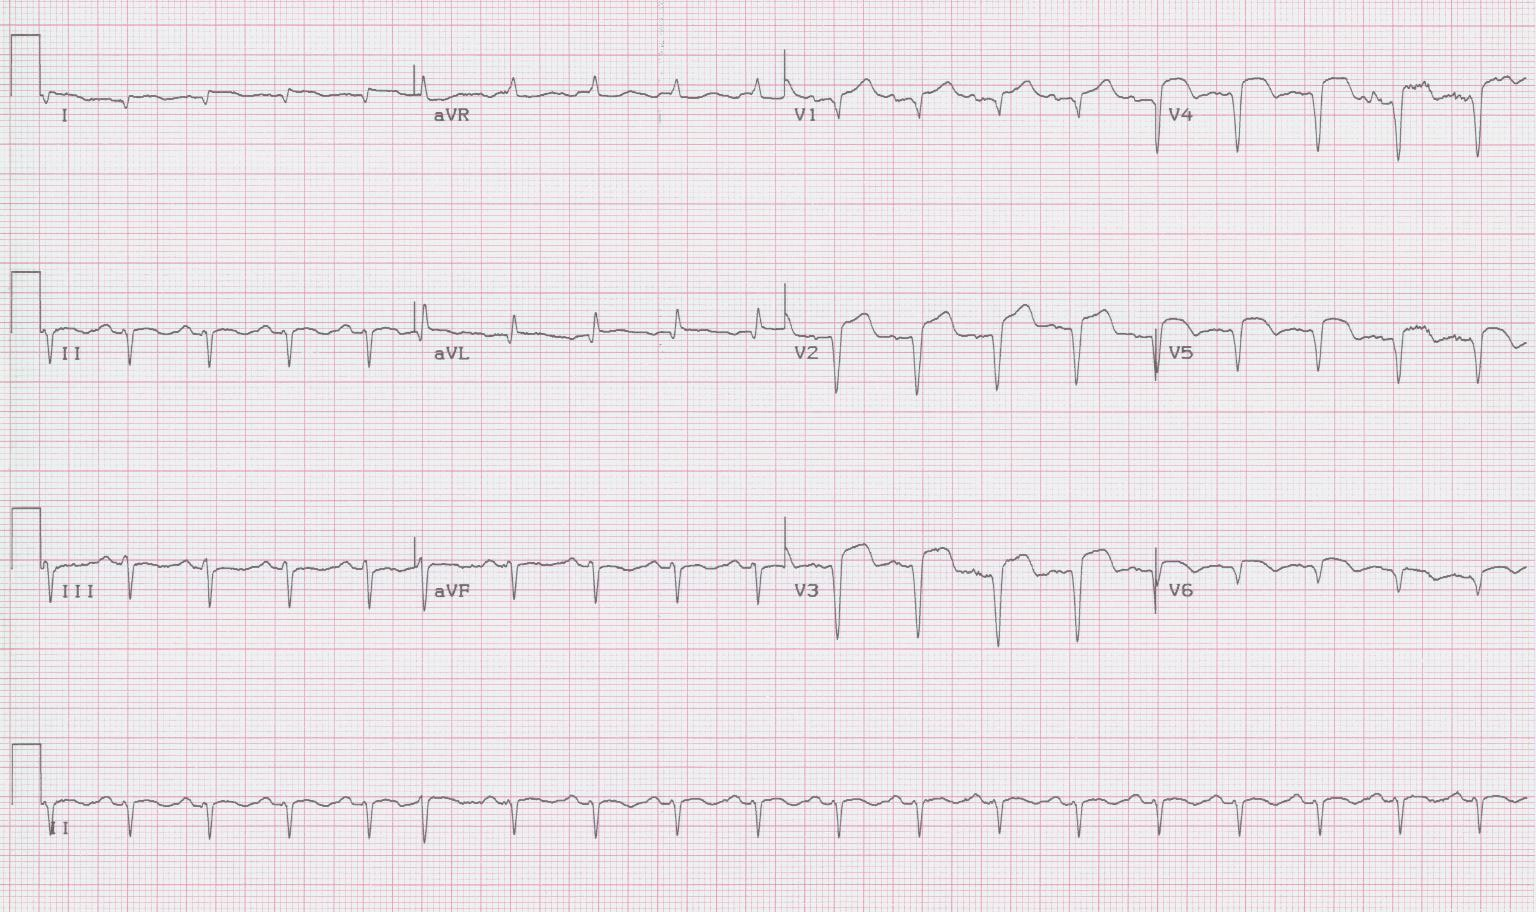 32 - Ventricular aneurysm